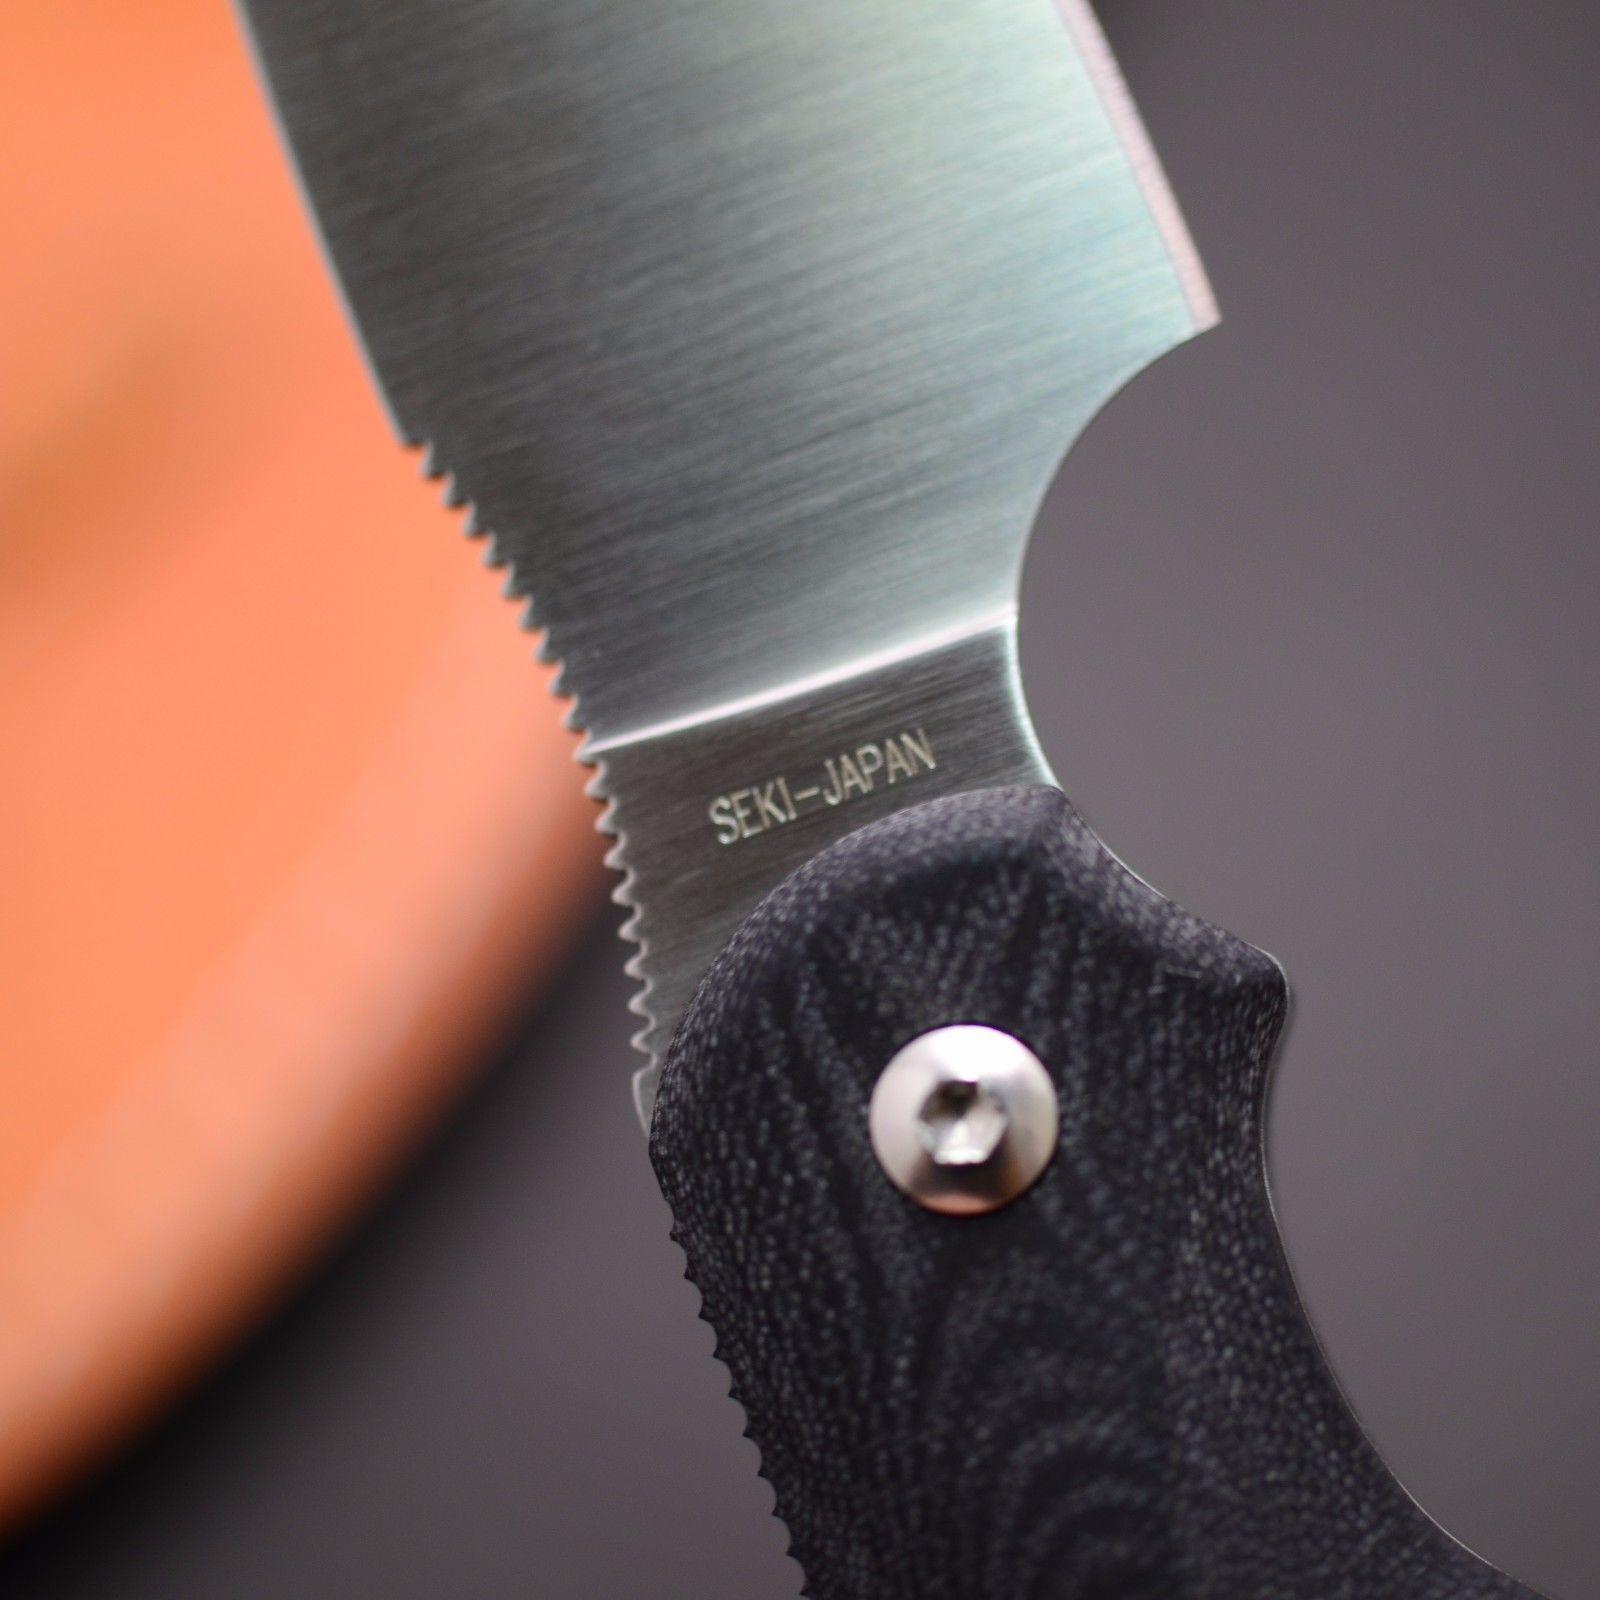 Фото 4 - Туристический нож G.Sakai, Camper En Fixed, ZDP-189, Black G-10